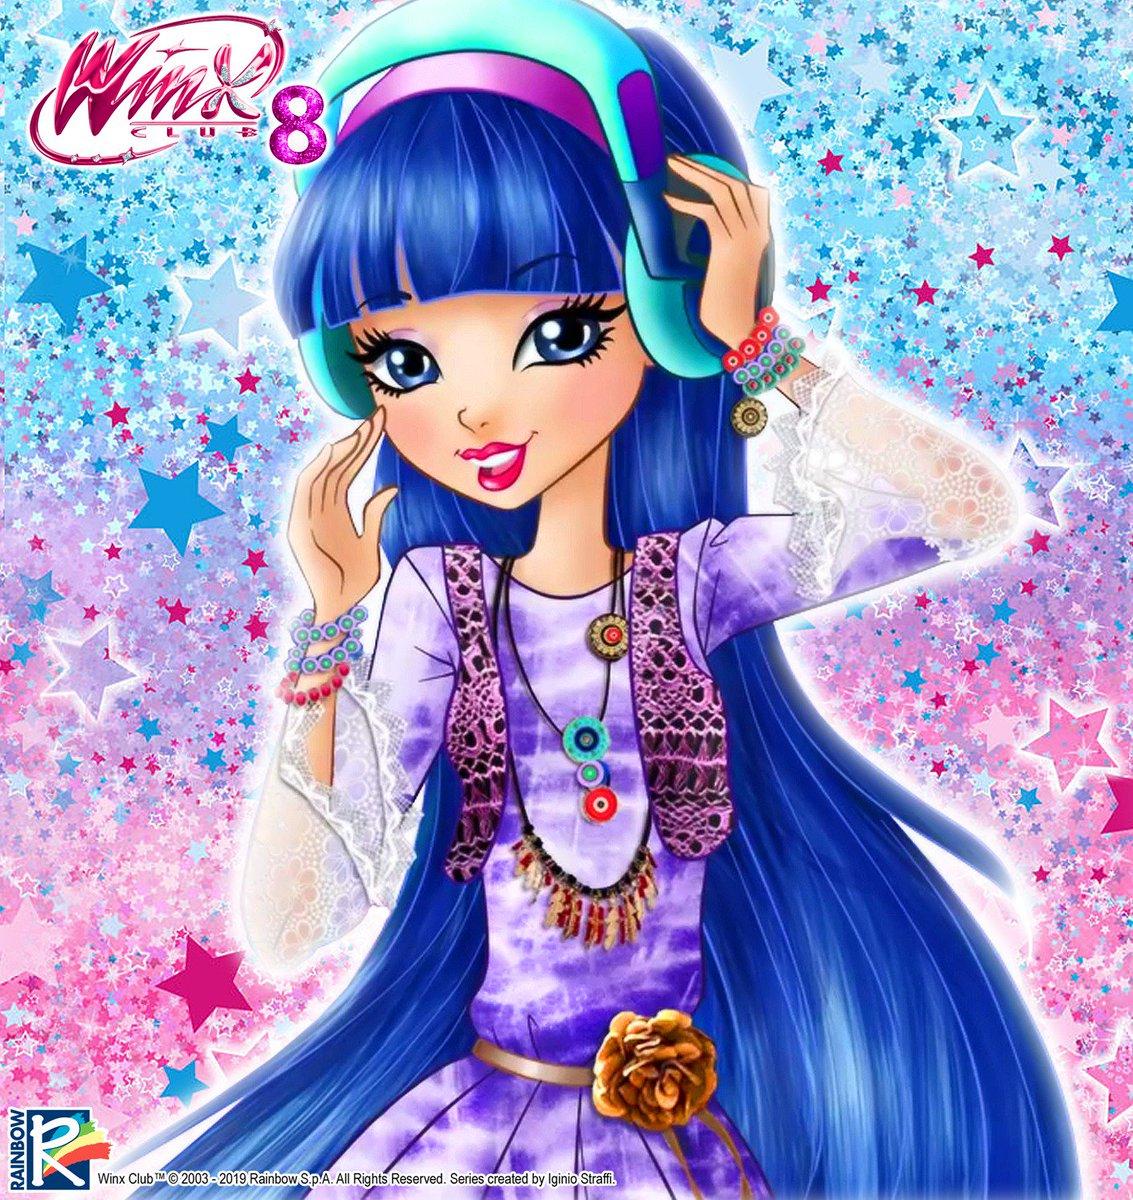 #Winx #WinxClub #Winx8 #Musa